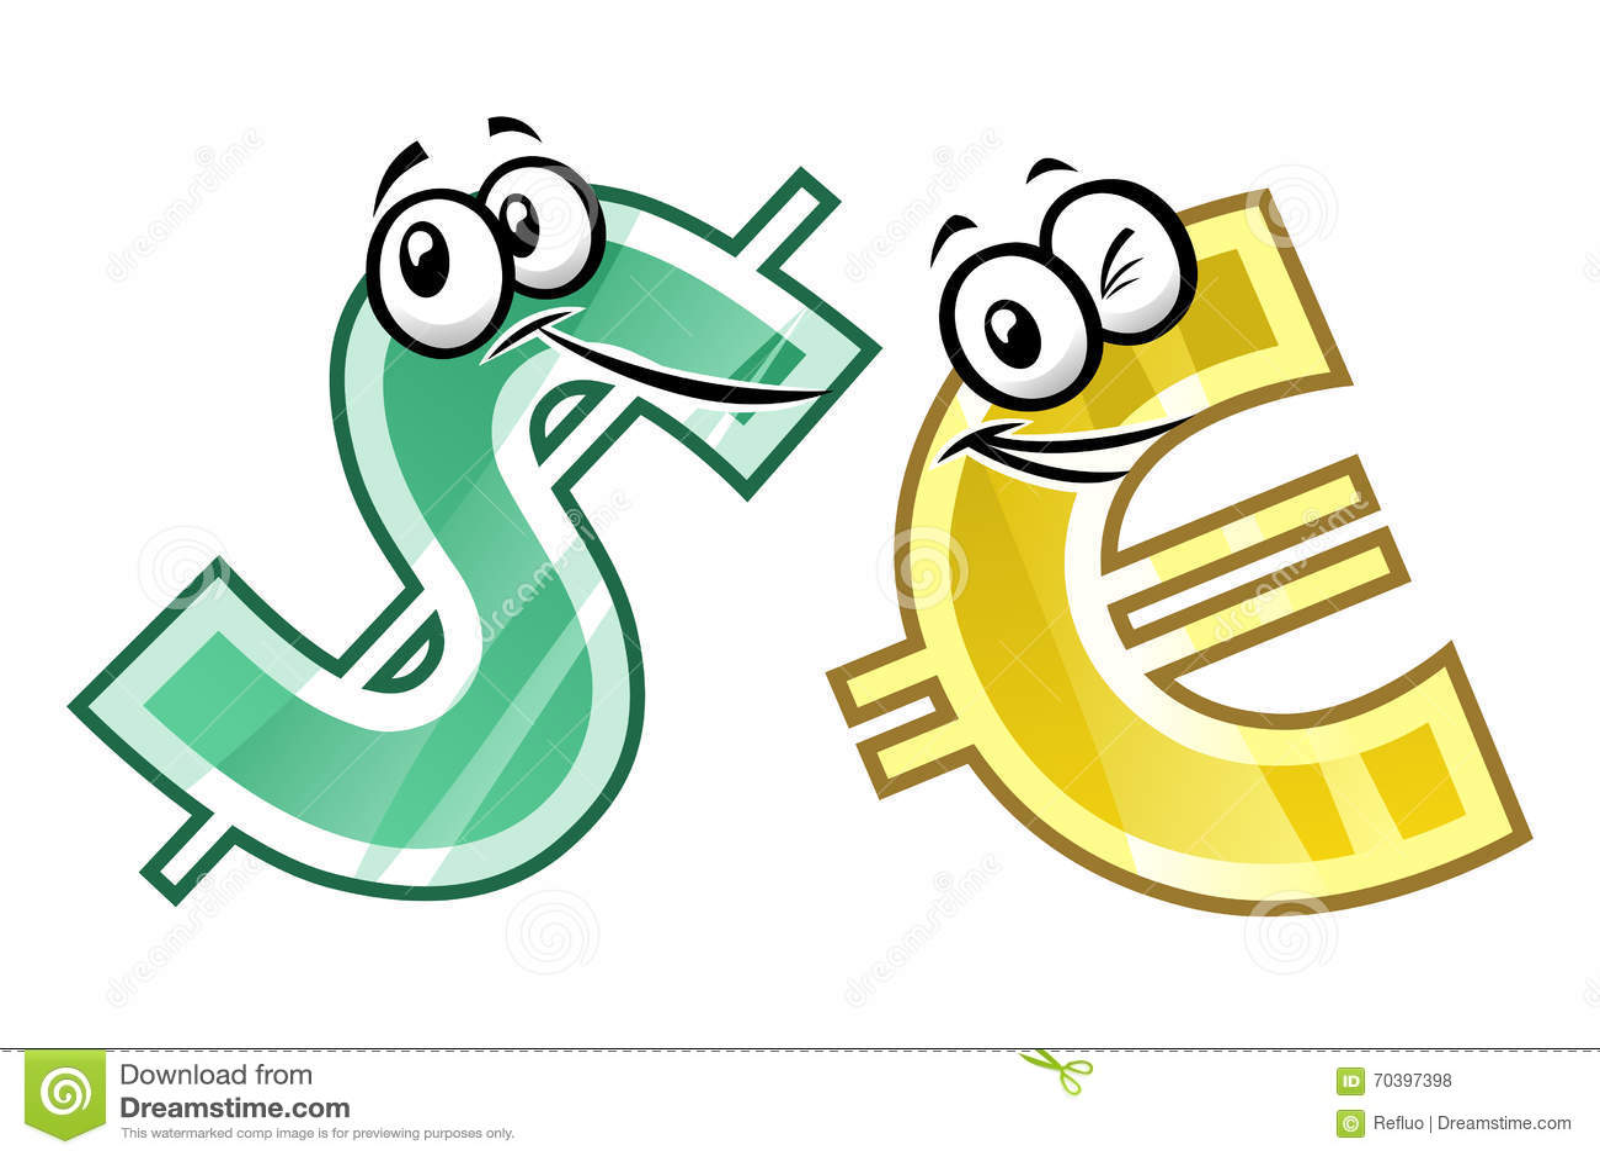 Cartoon Dollar And Euro Stock Vector Illustration Of Cash 70397398